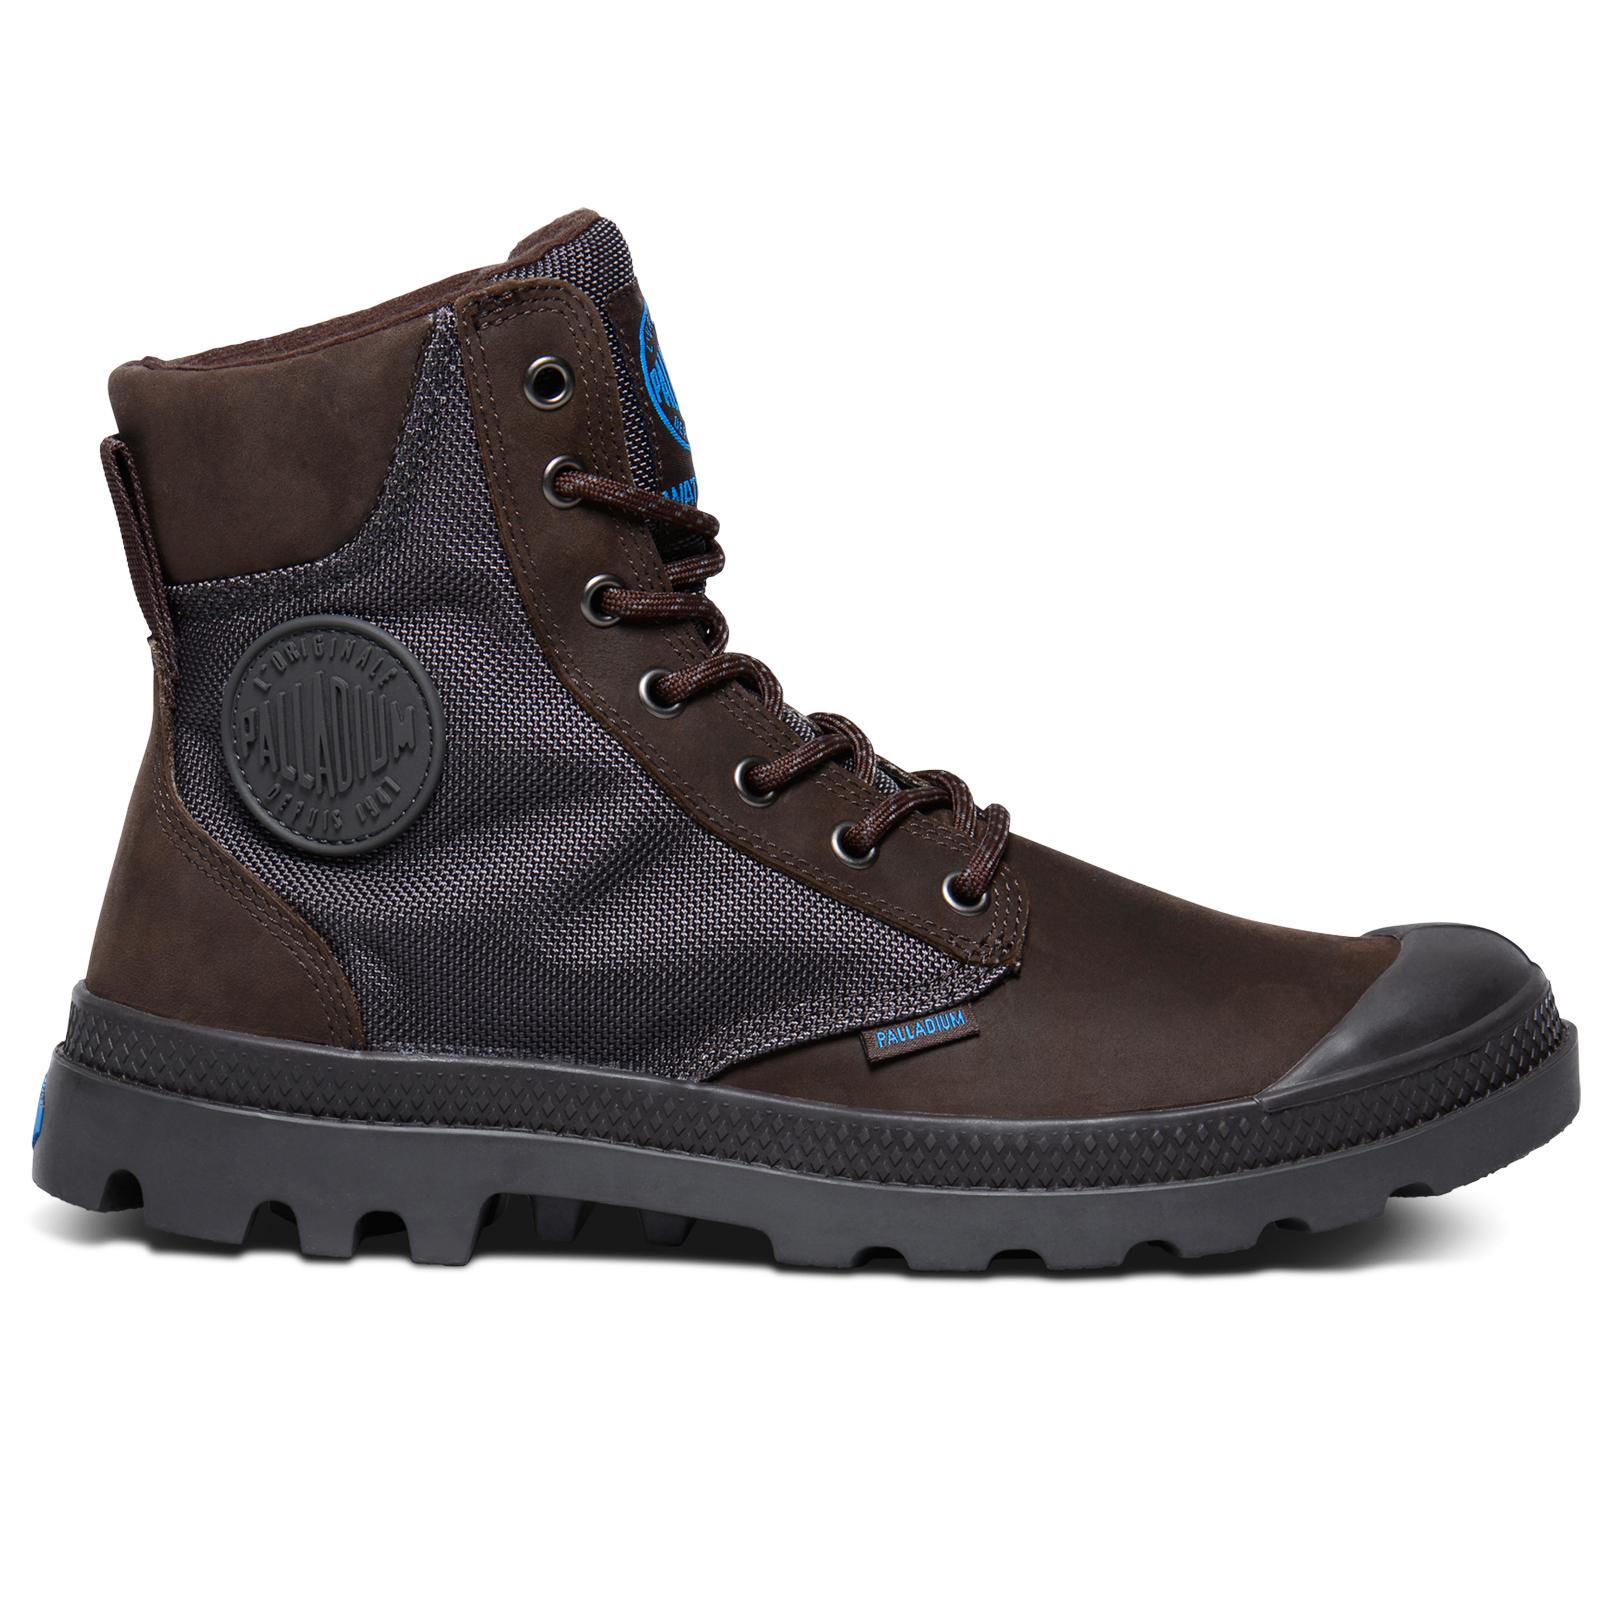 Palladium-Pampa-Sport-Mens-Shoes-Womens-Waterproof-Walking-High-Top-Ankle-Boots thumbnail 24